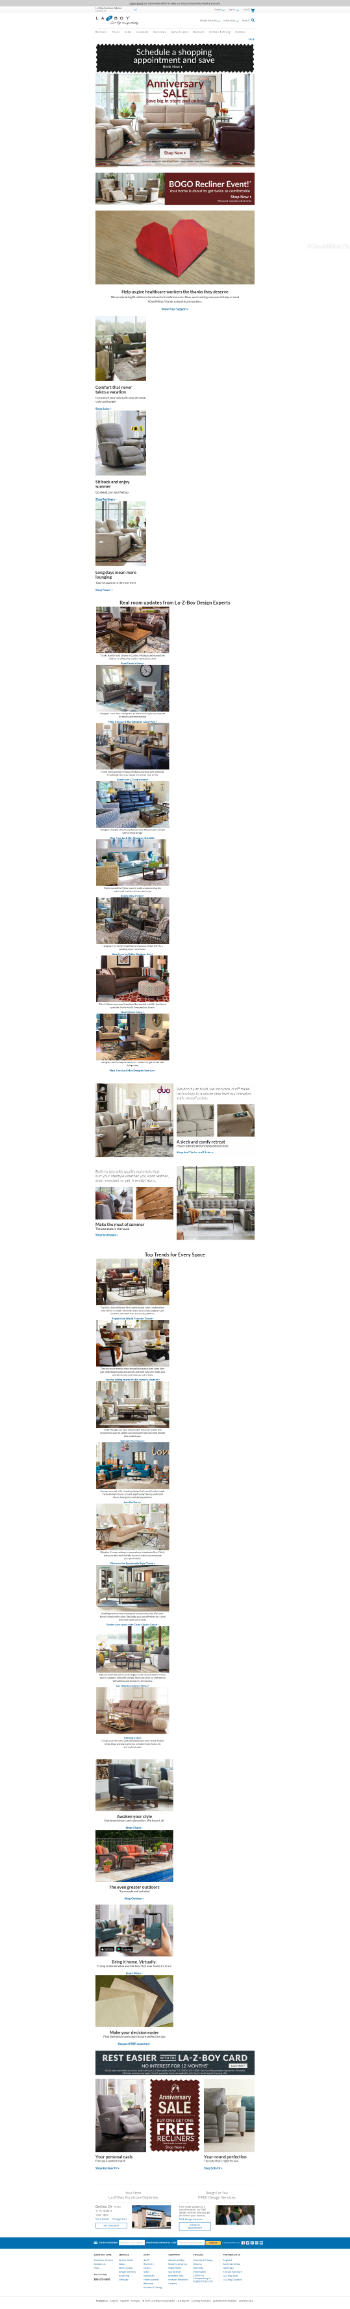 La-Z-Boy Incorporated Website Screenshot